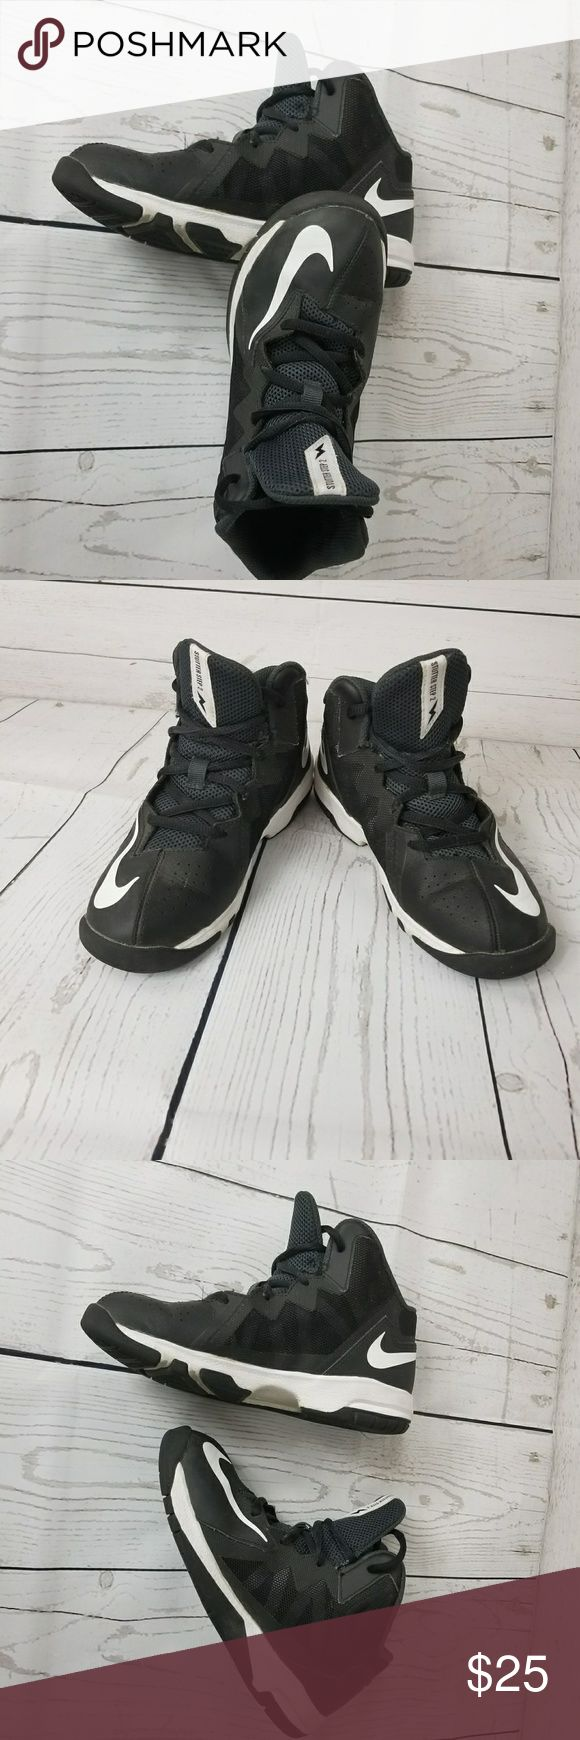 Kids Nike Stutter Step 2 Size 2Y Kids Nike Stutter Step 2 Size 2Y Nike Shoes Sneakers